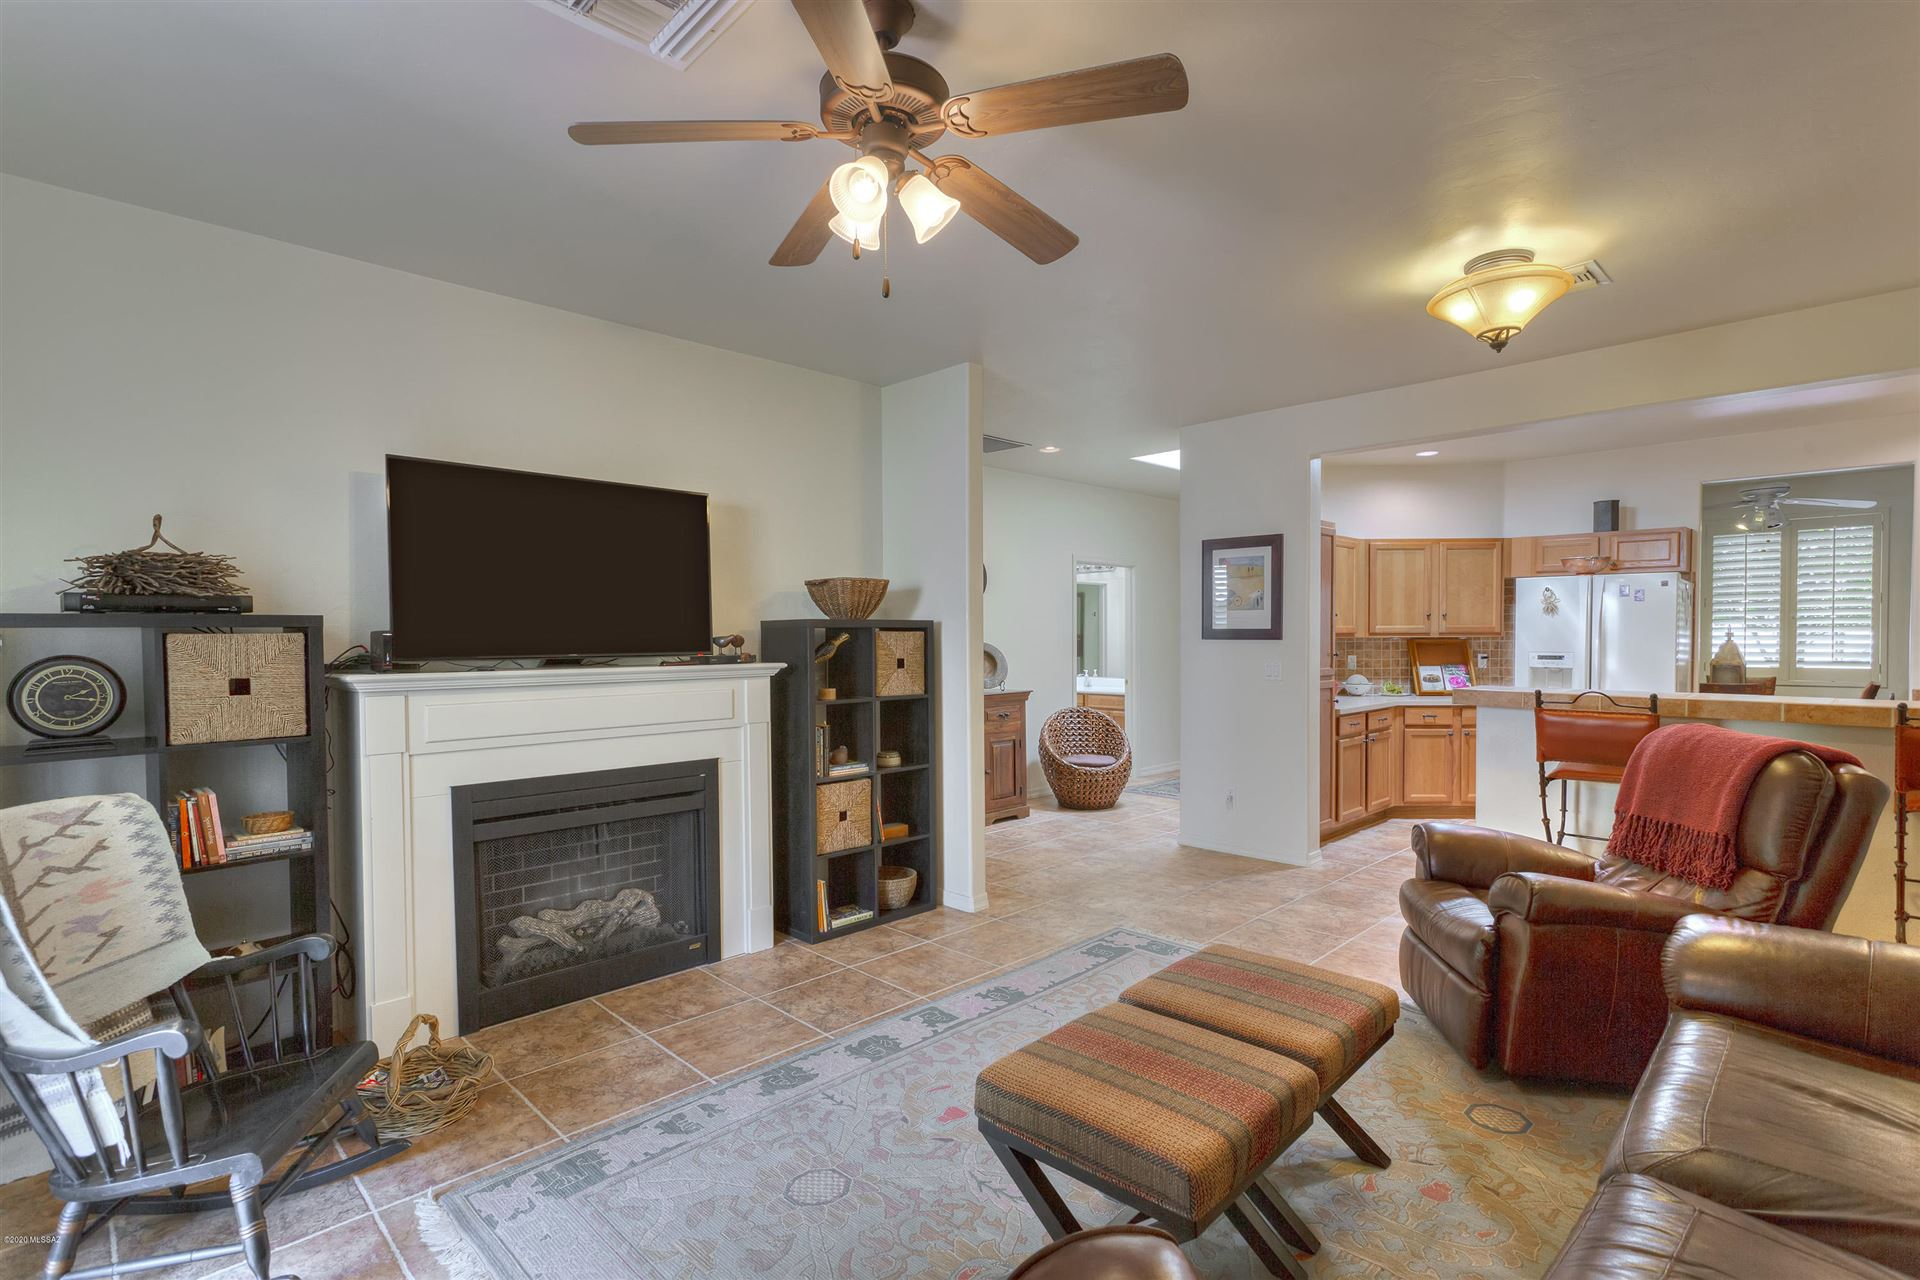 440 W Deerwood Lane, Green Valley, AZ 85614 - #: 22015675